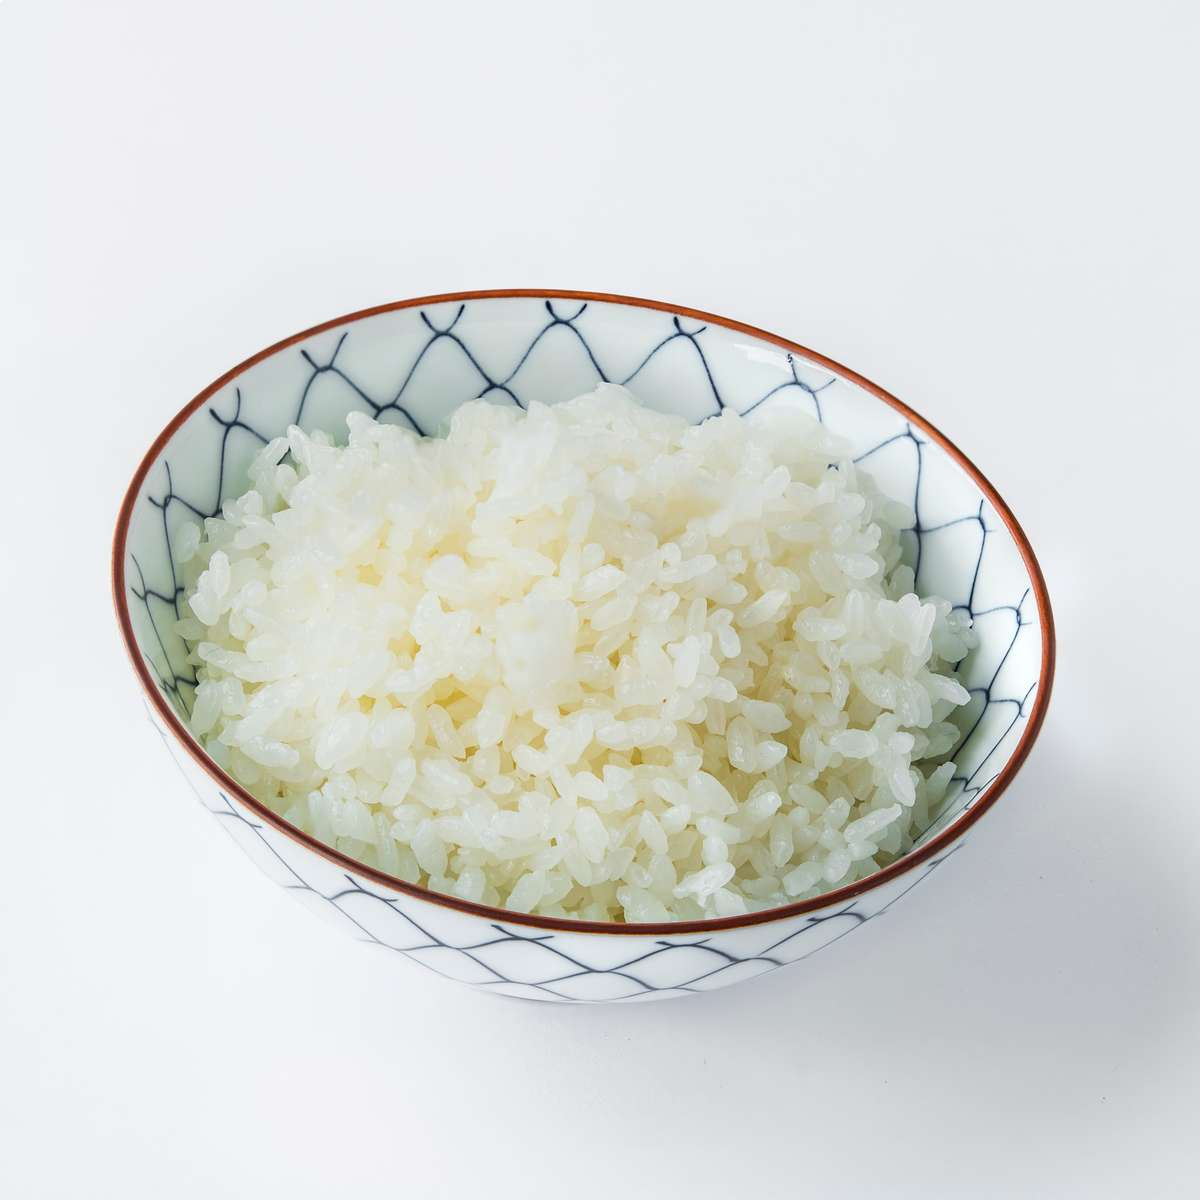 Steamed White Rice